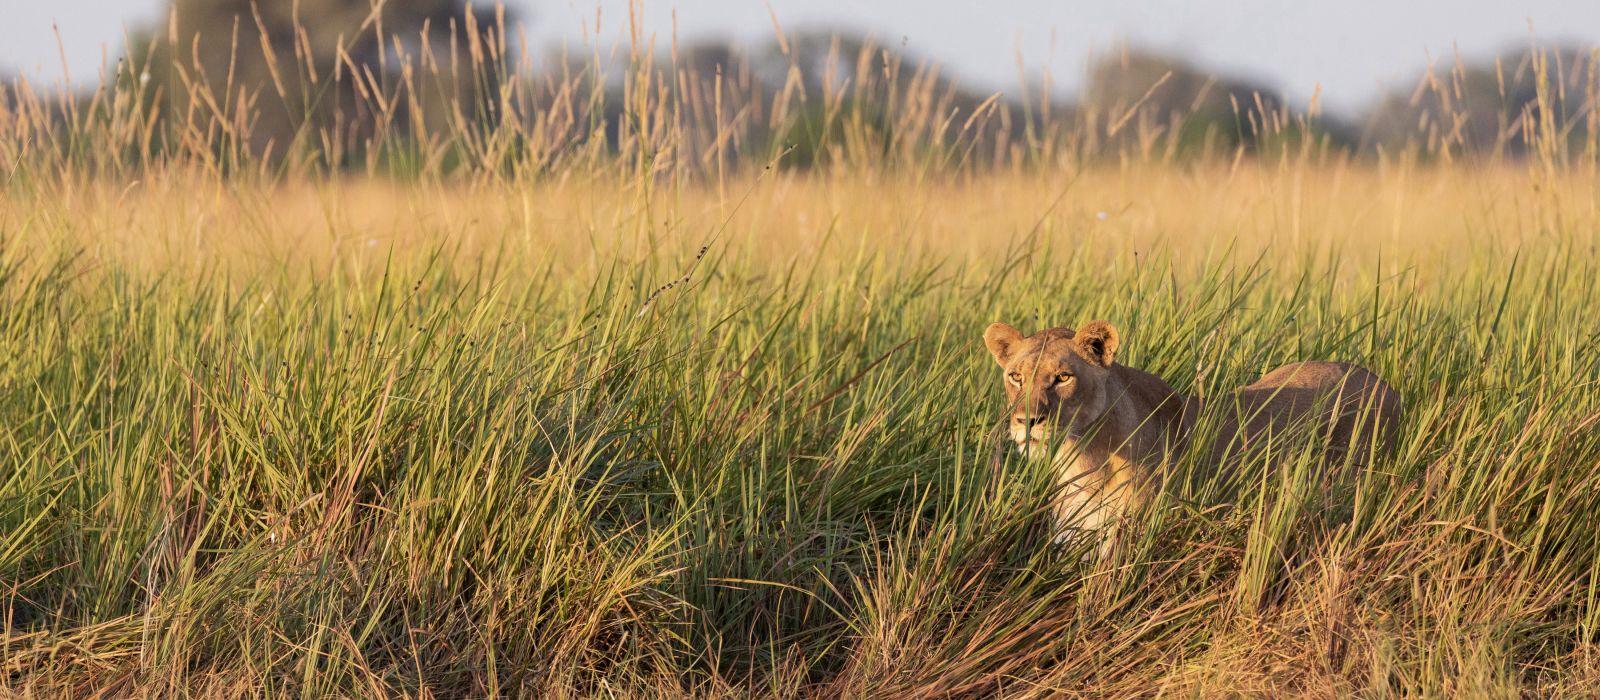 Female Lion walking in the grass in the Okavango Delta, Botswana, Africa